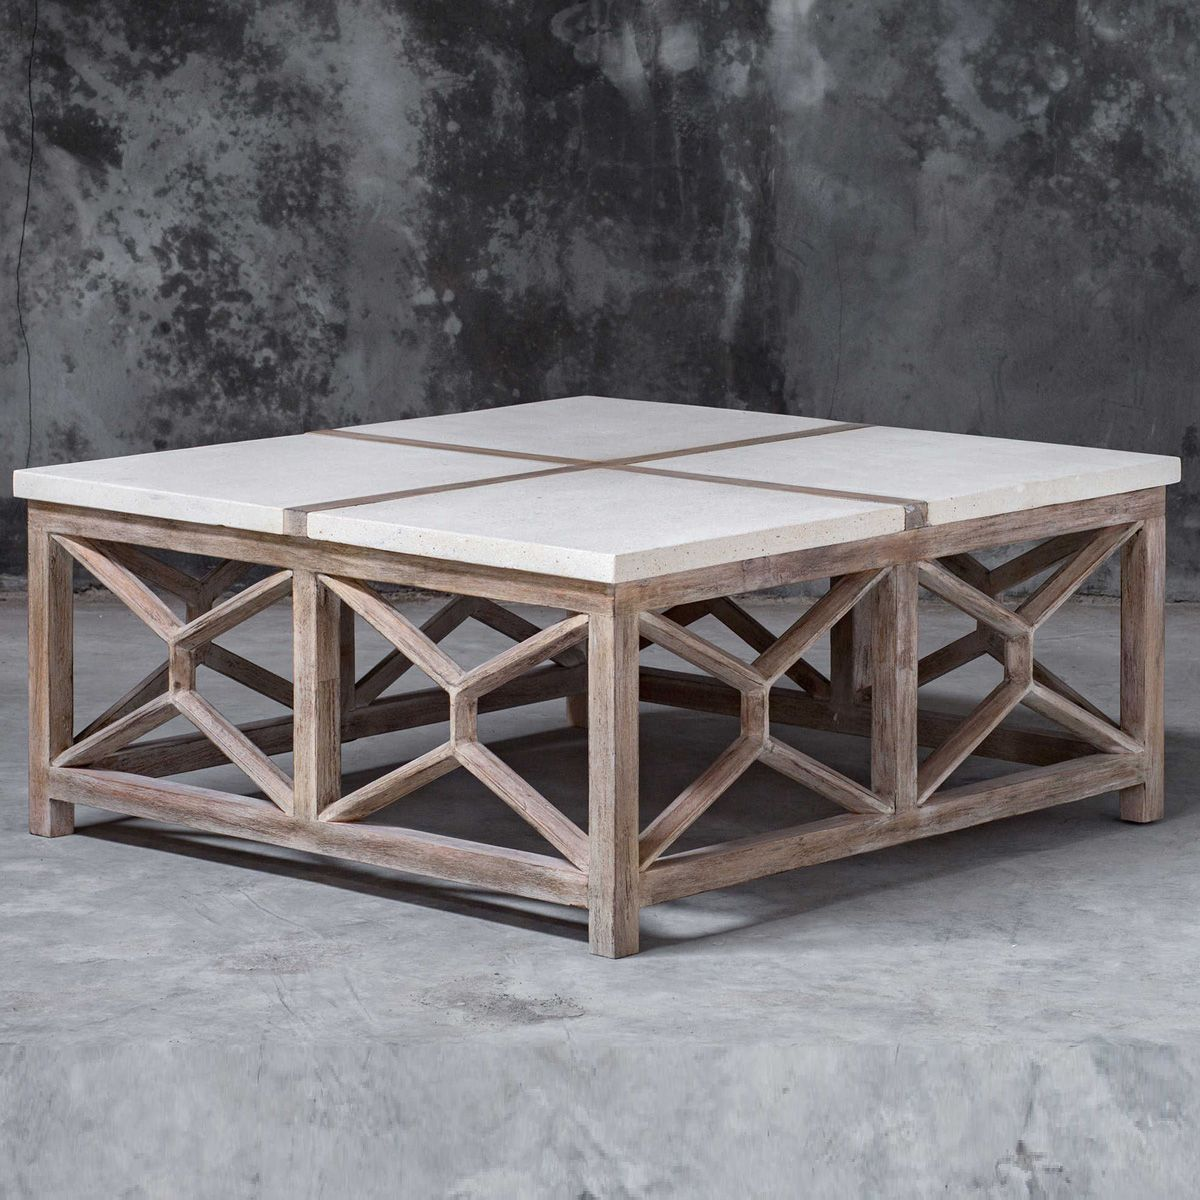 Melbourne Limestone 40 Coffee Table Stone Coffee Table Coffee Table Wood Geometric Coffee Table [ 1200 x 1200 Pixel ]